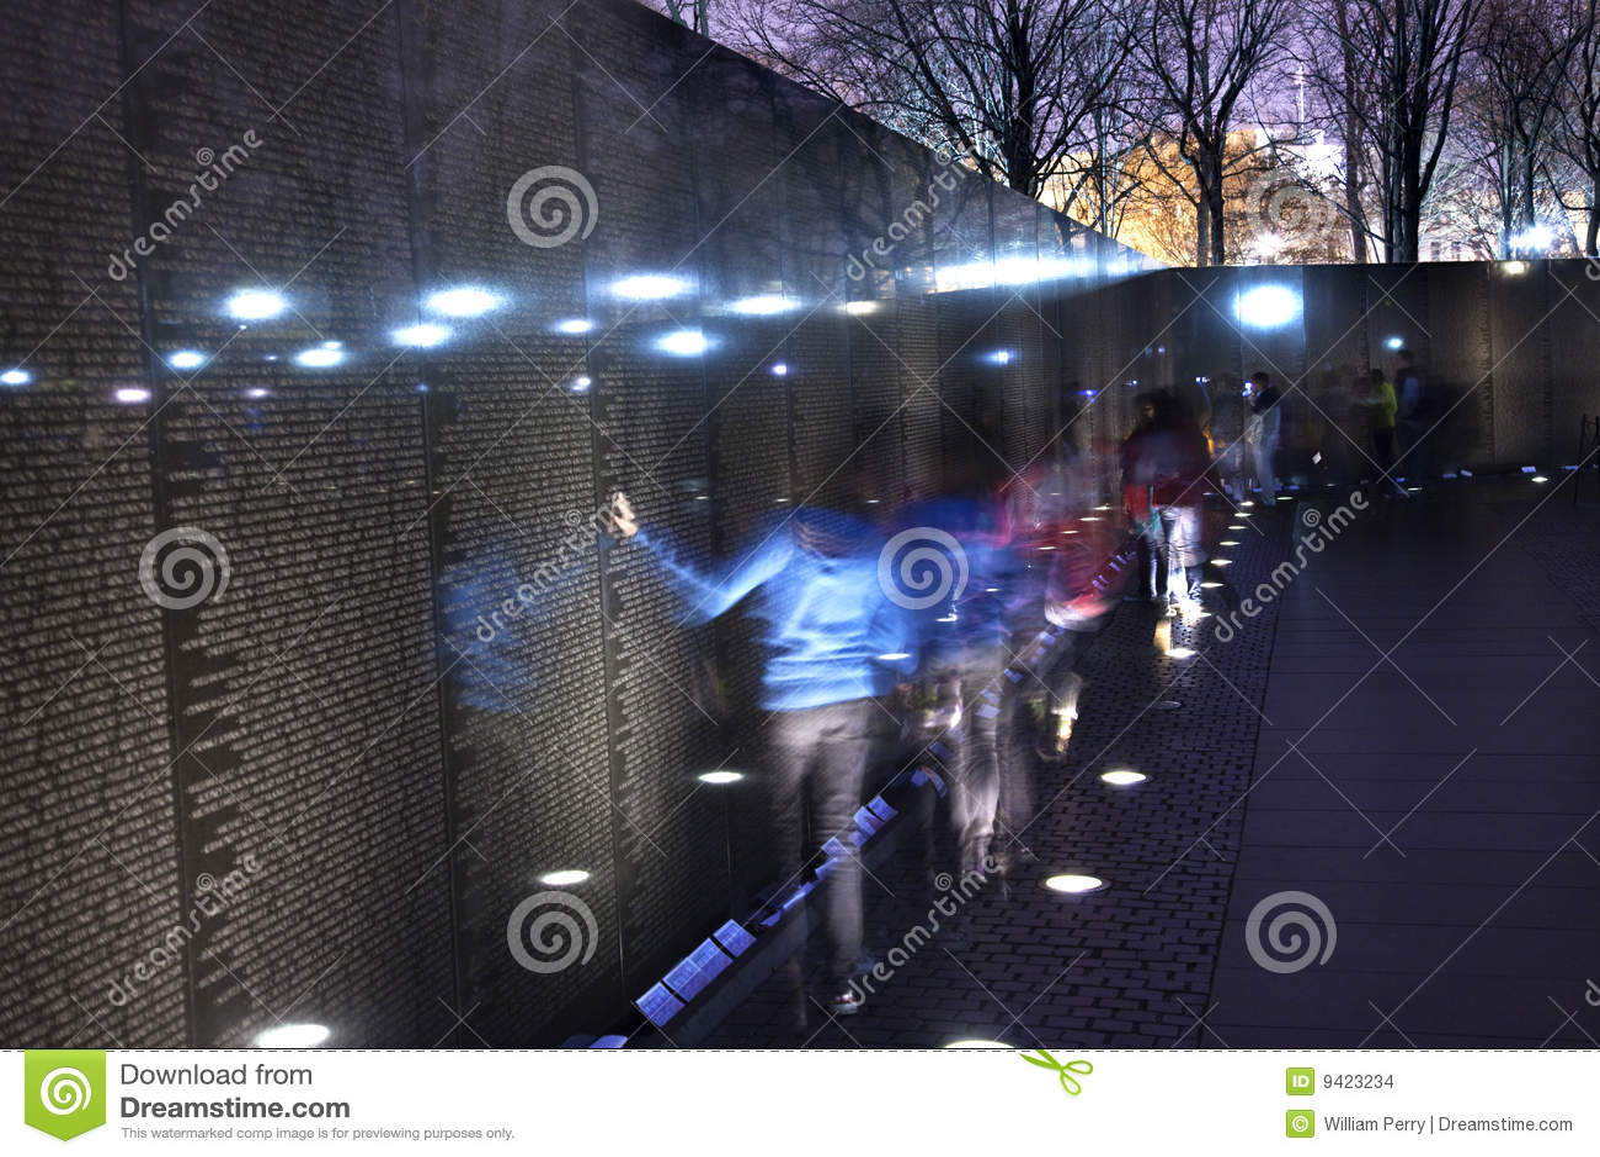 Vietnam Memorial Black Wall Night Washington Dc Stock